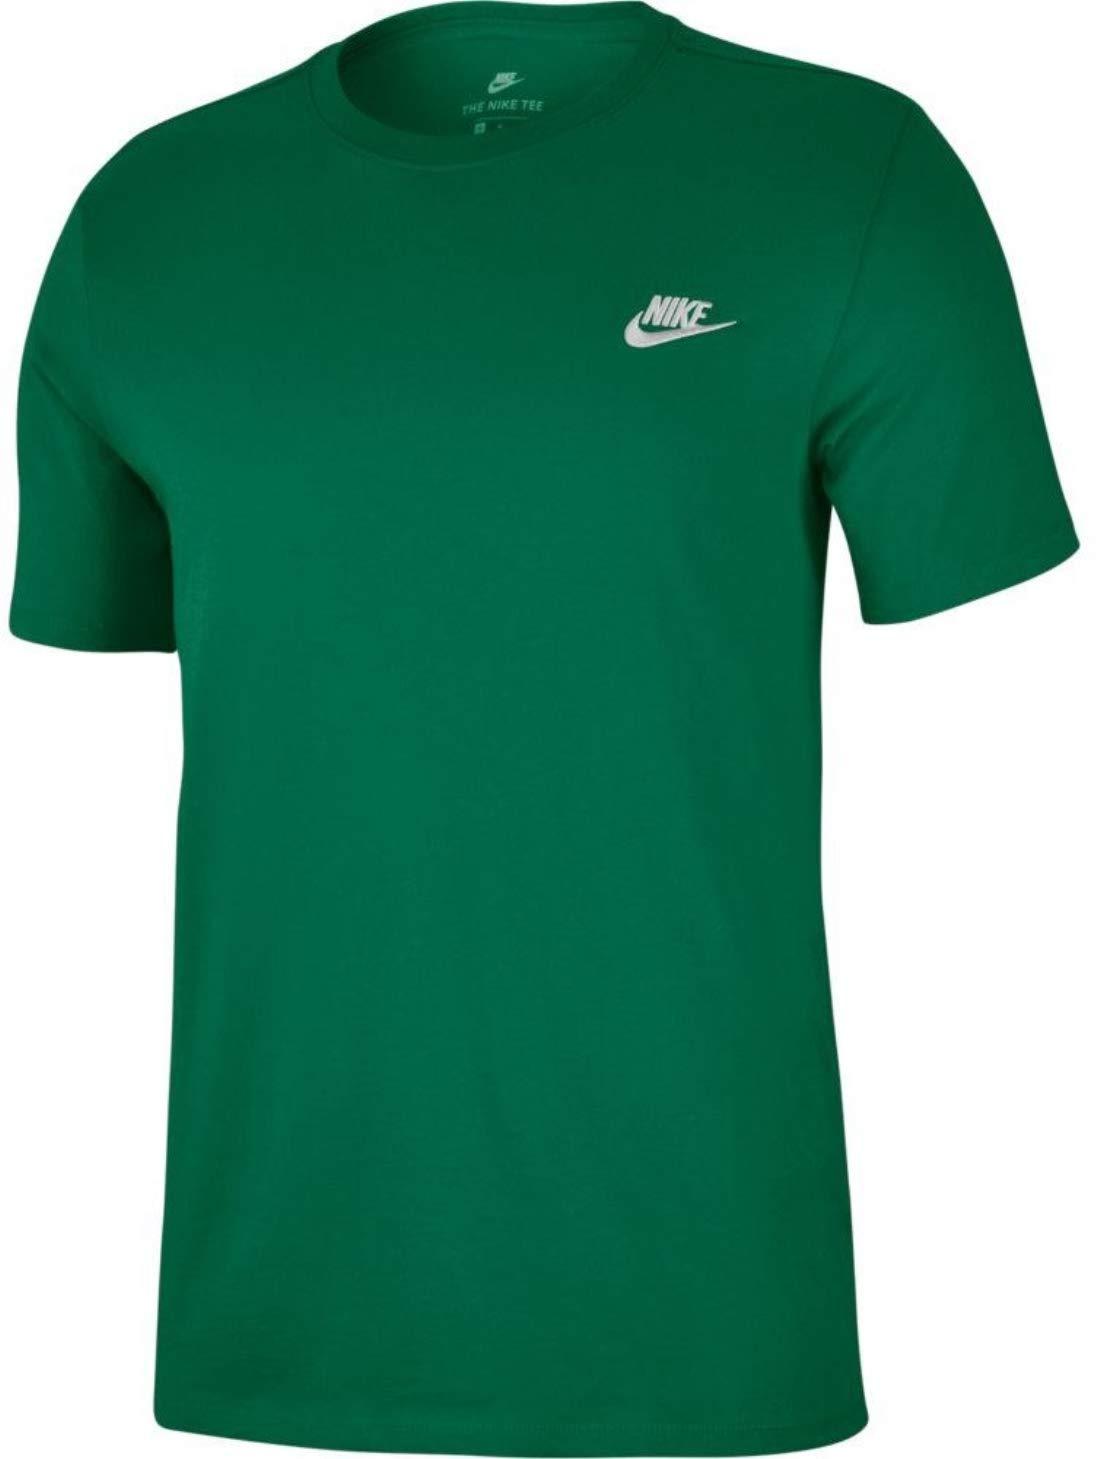 9e884ce7 Mens 3x Nike T Shirts - DREAMWORKS